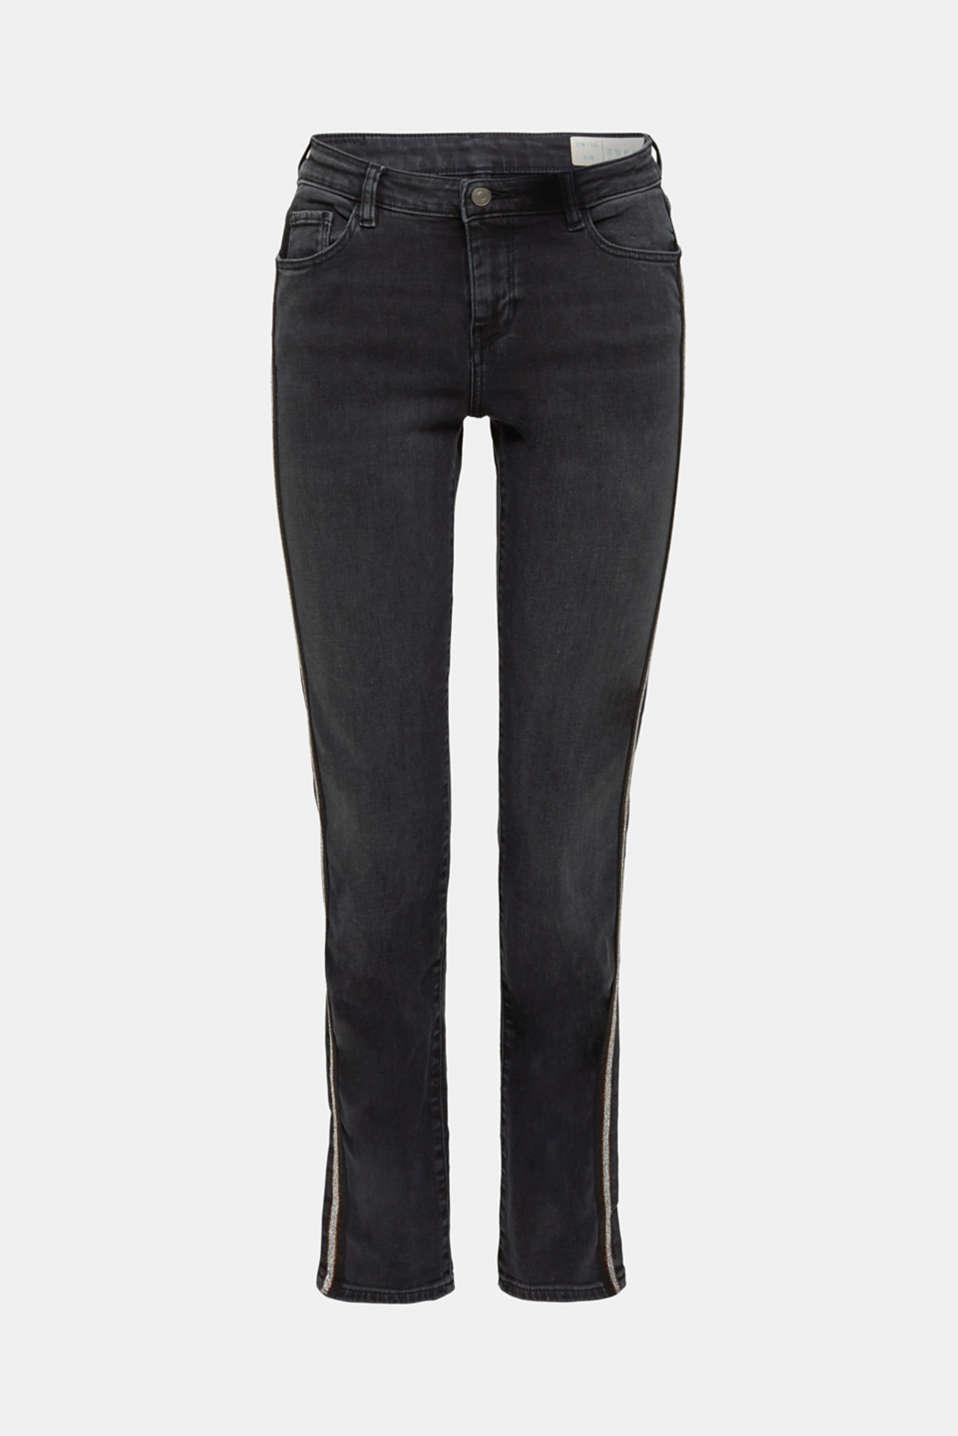 Pants denim, BLACK DARK WASH, detail image number 7